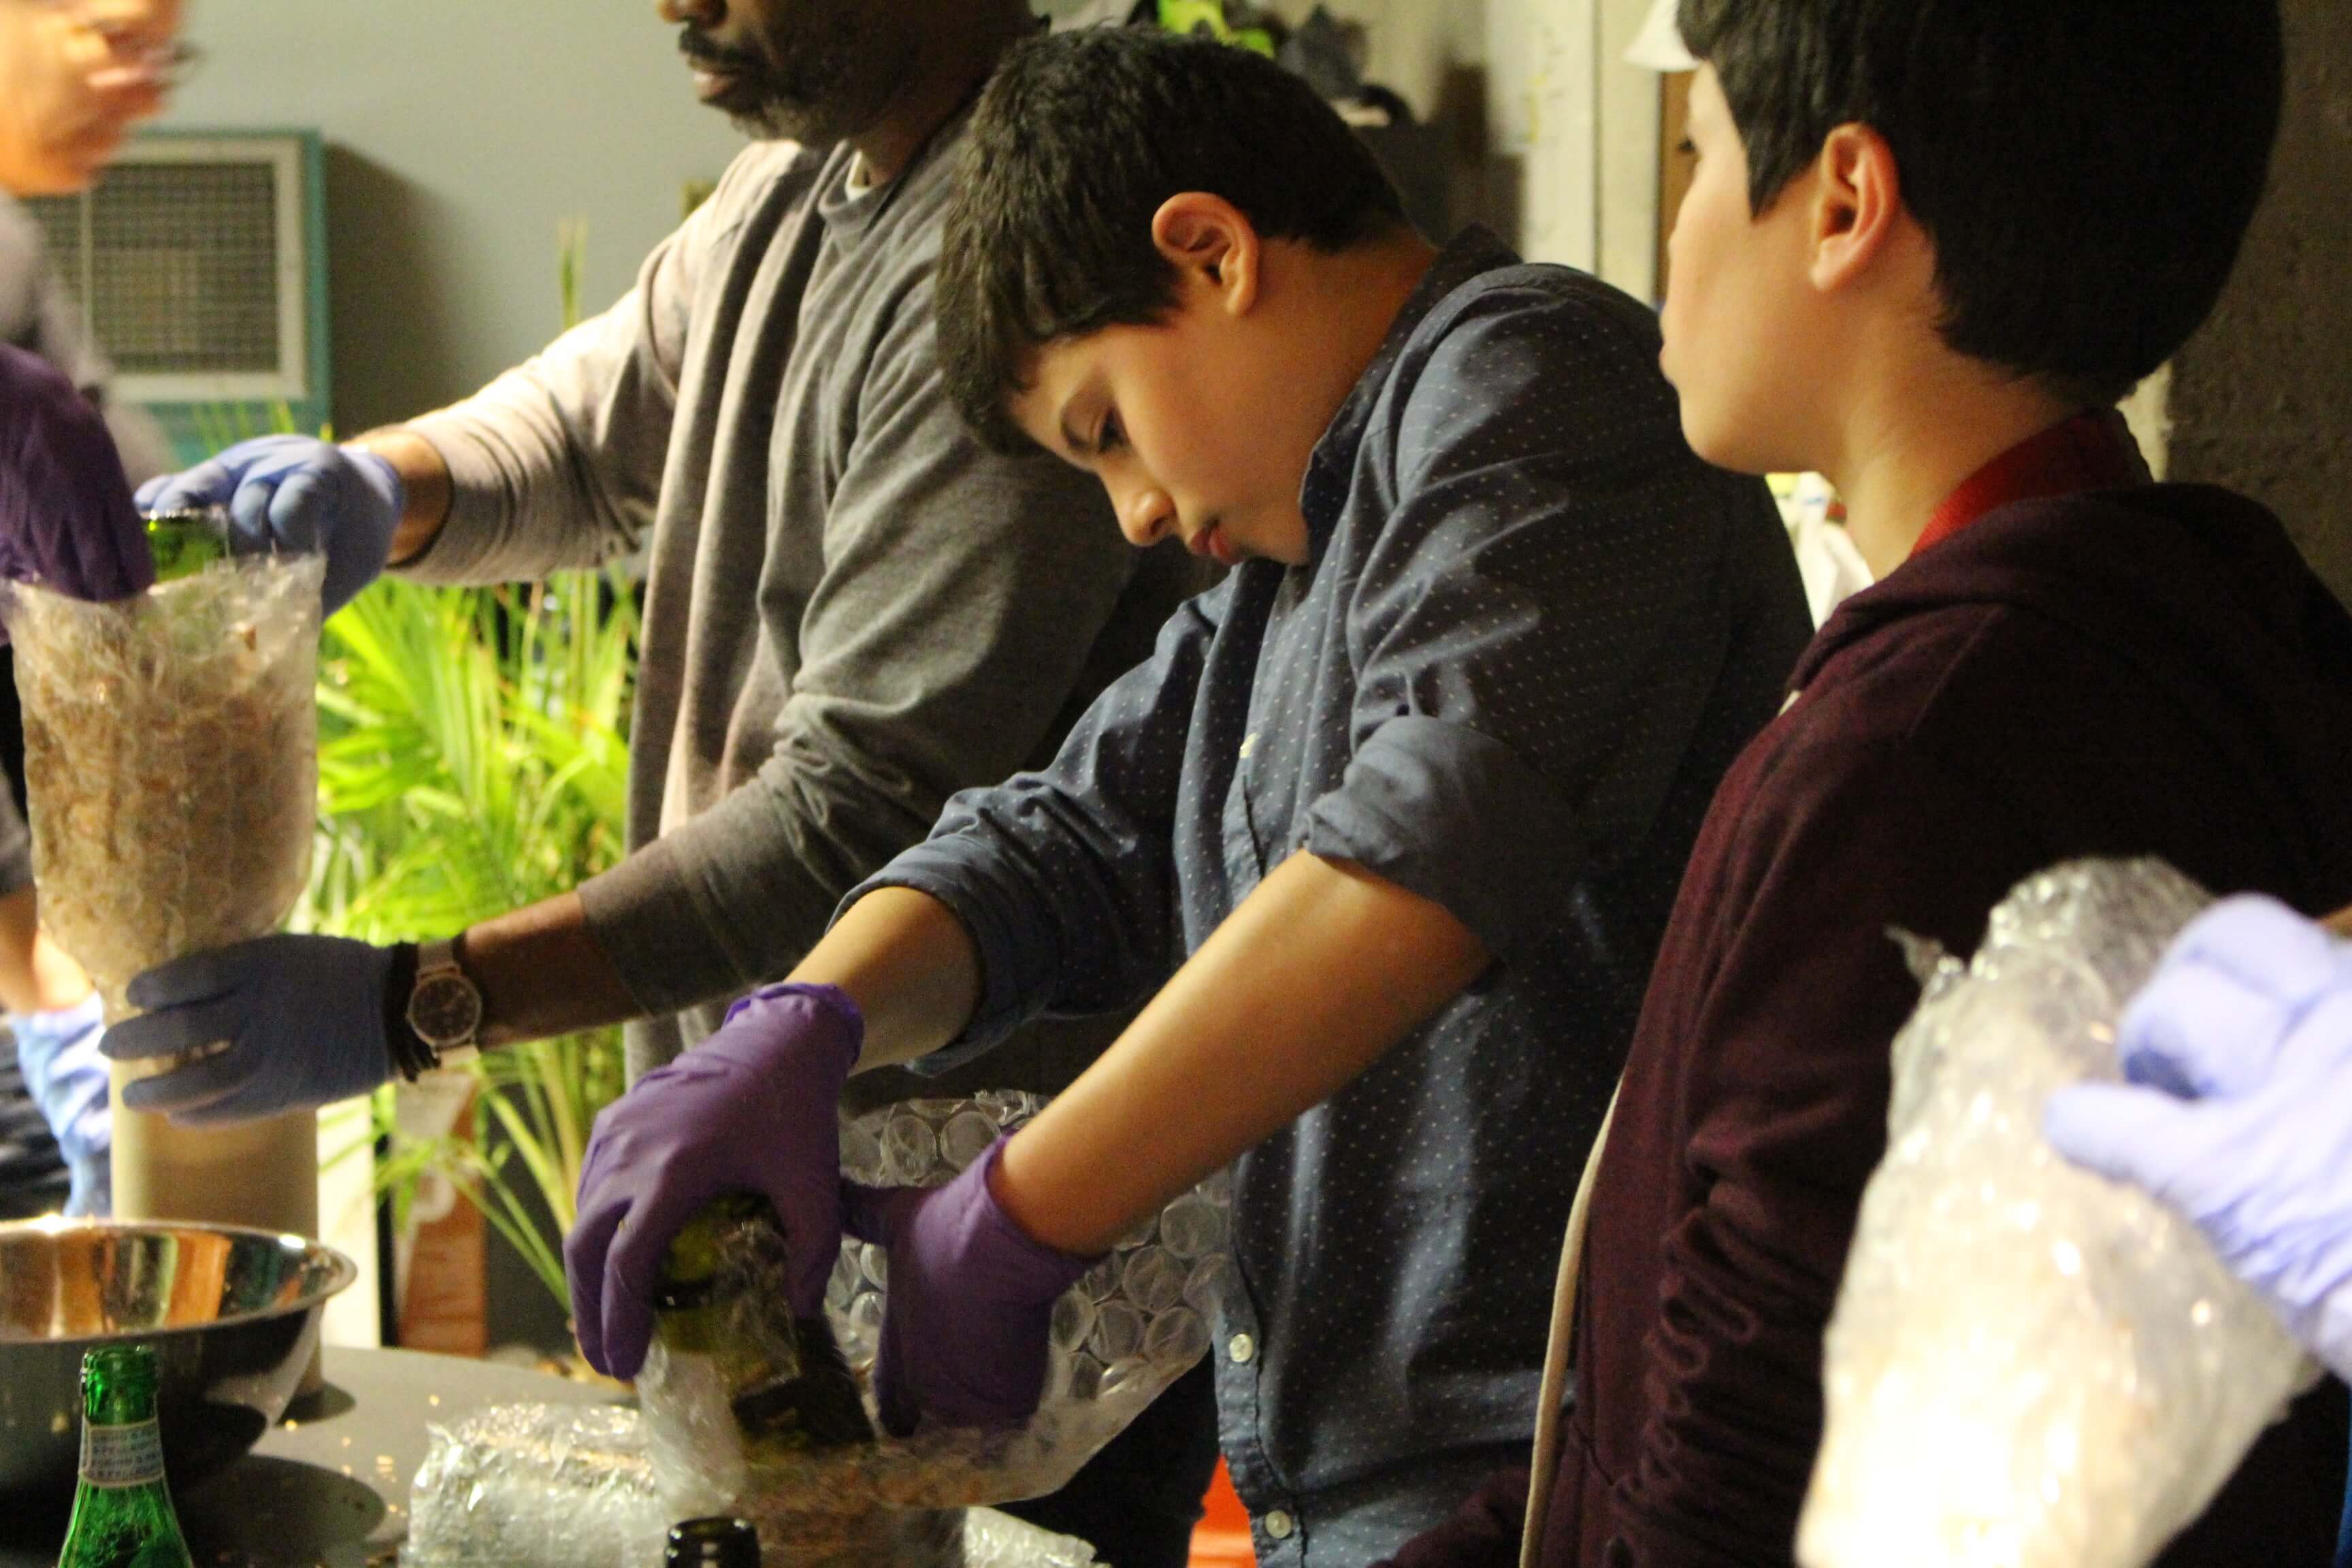 Youth from Maison des Jeunes Côte-des-Neiges creating molds